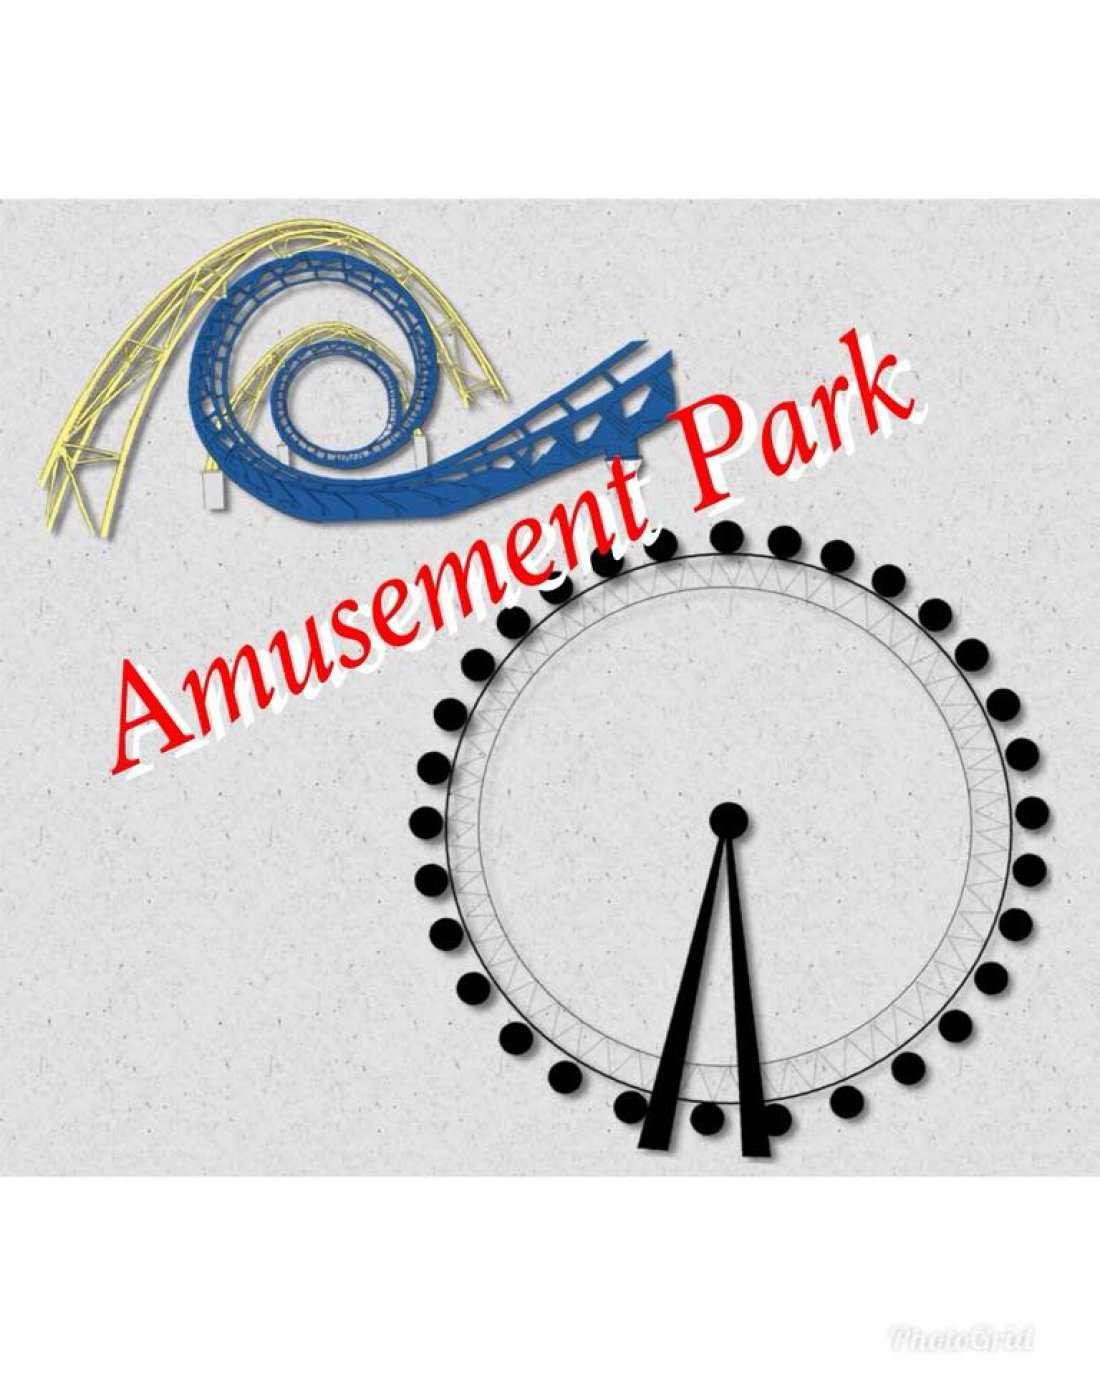 Stem Themed Amusement Park - BridgelandCypress